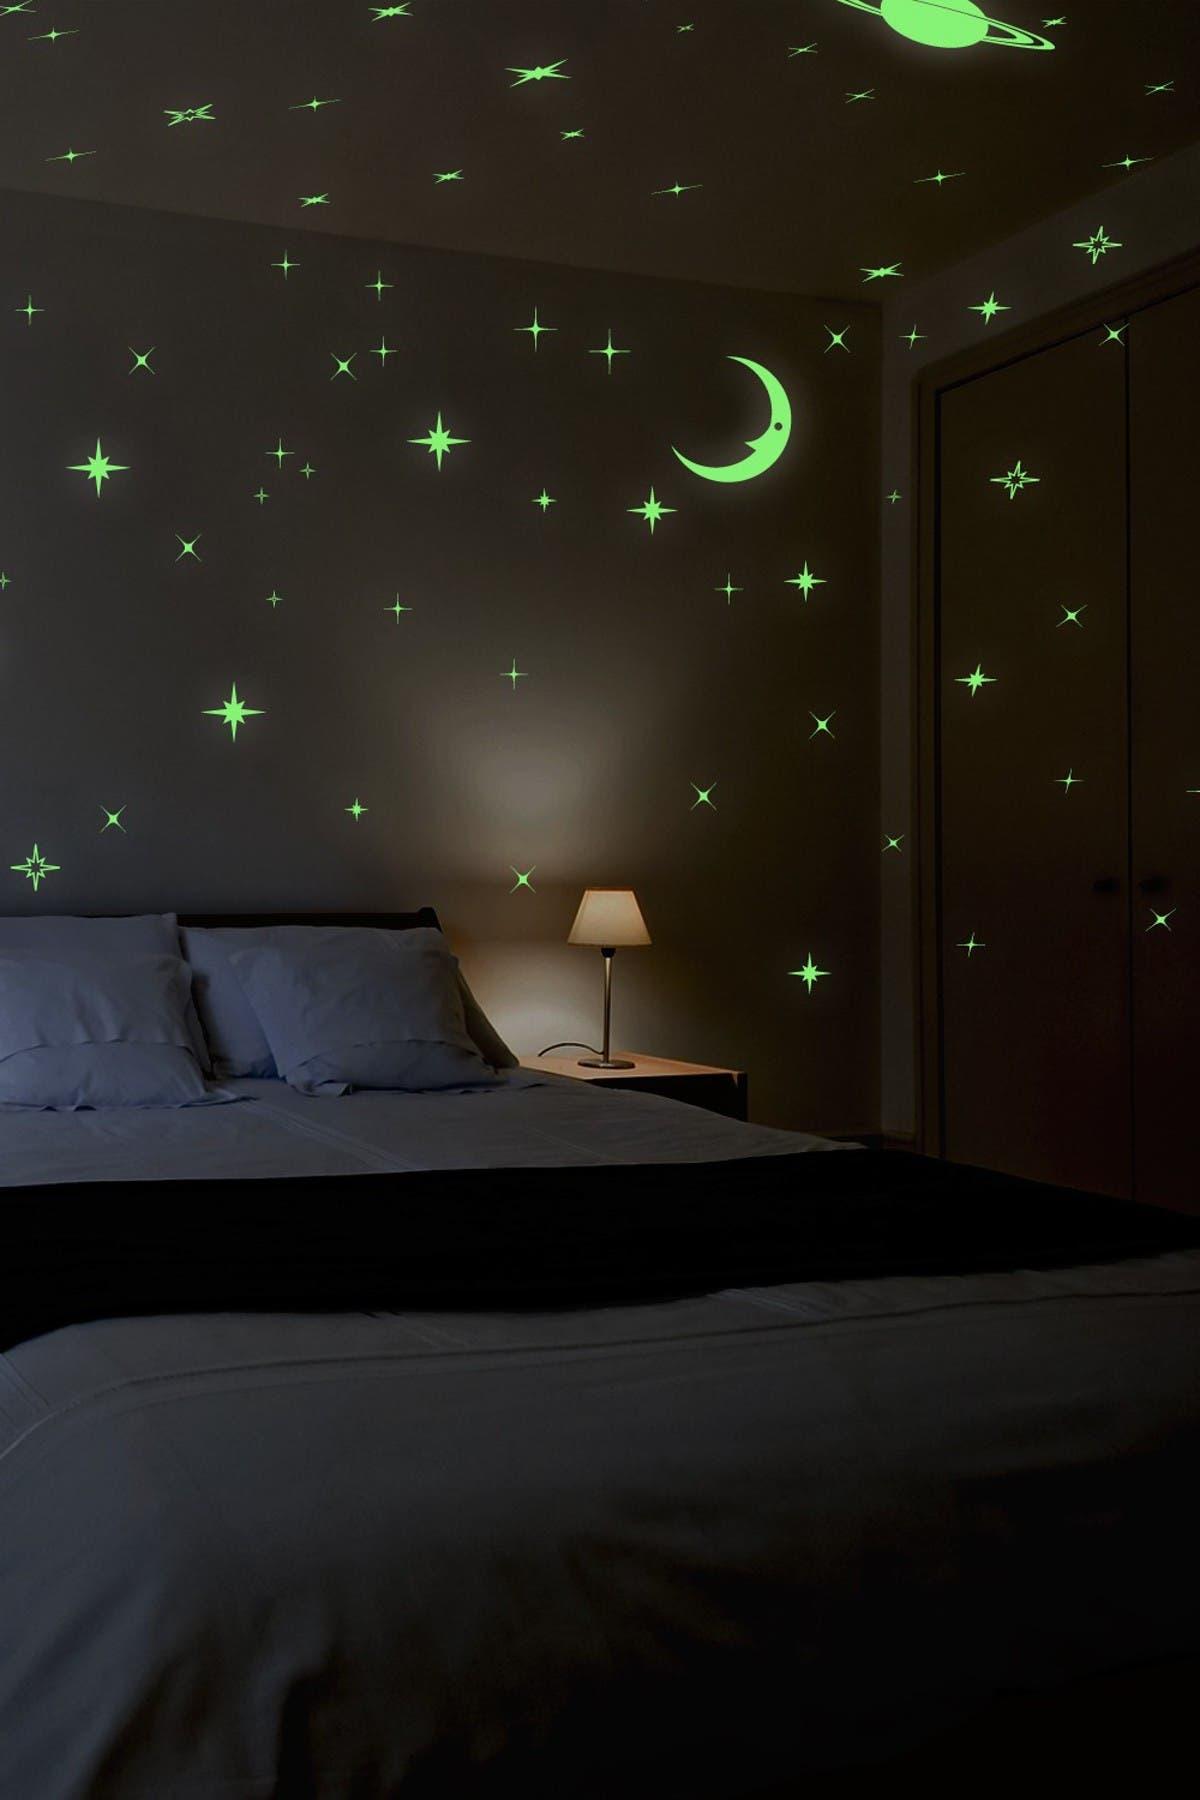 Image of WalPlus Green Wall Sticker Art Glow In Dark Starry Night